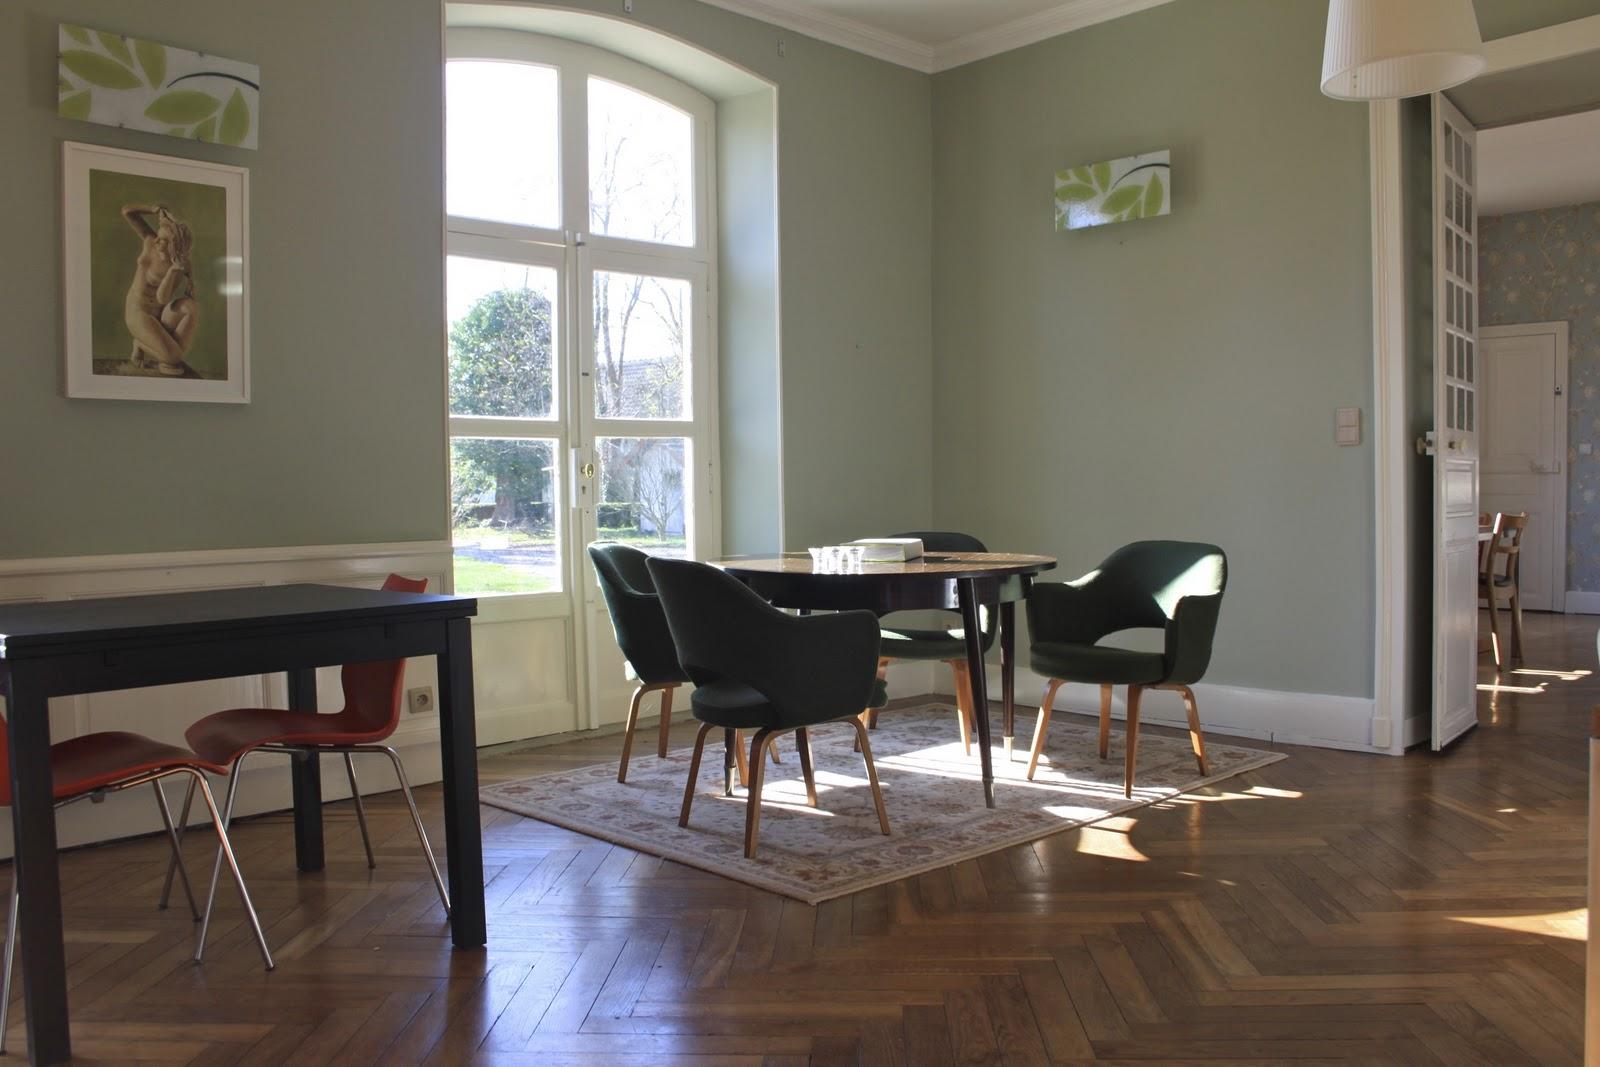 Eetkamer behang idee - Idee decoratie eetkamer ...